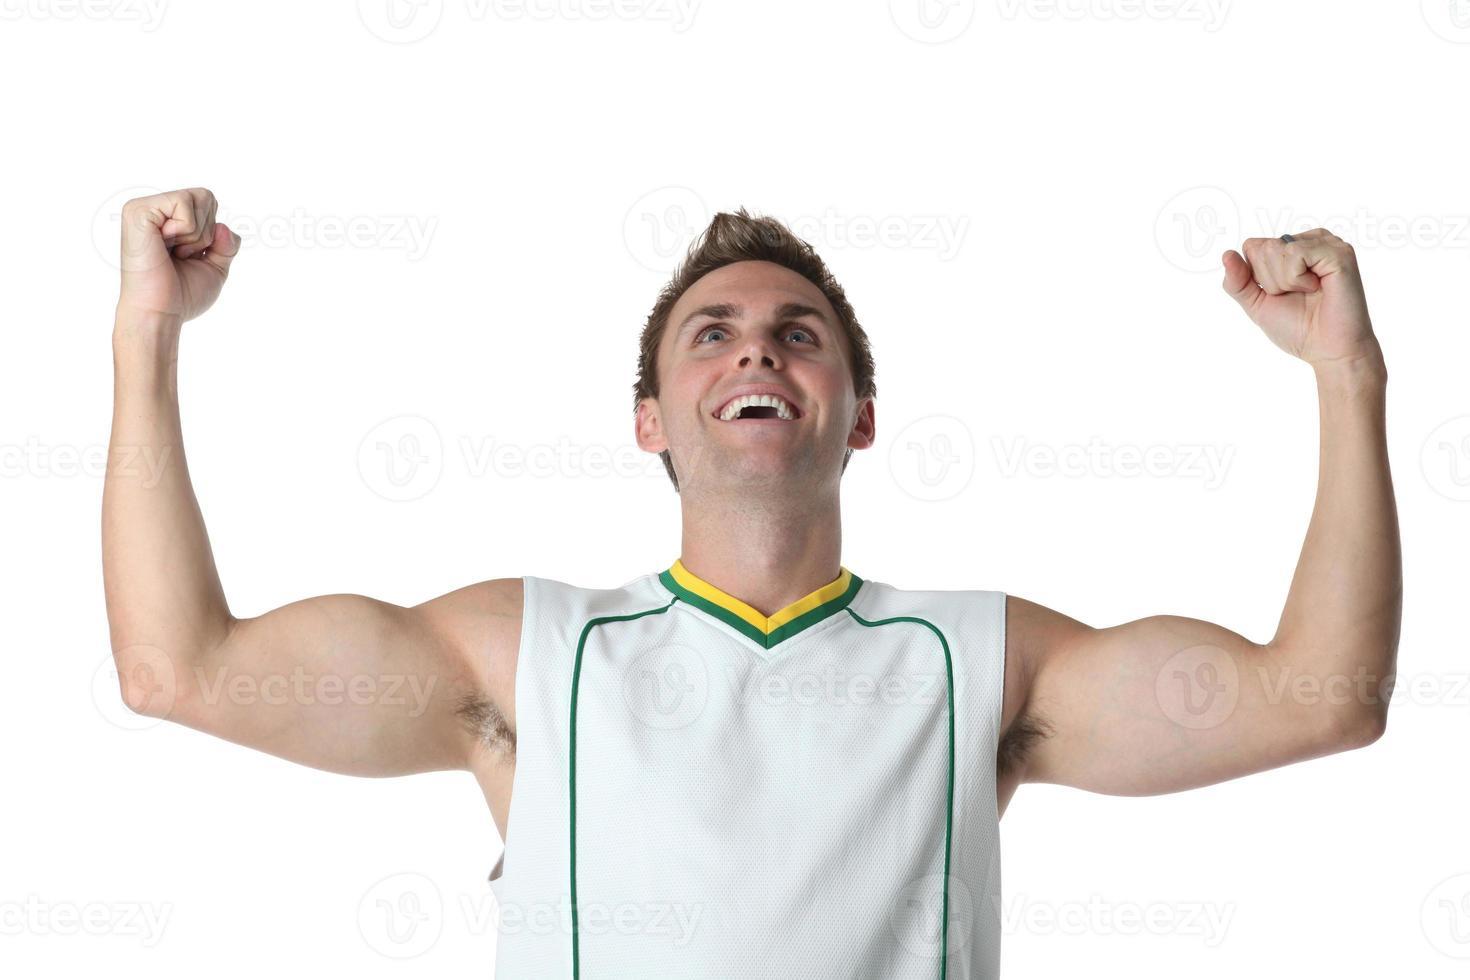 atleet juichen foto